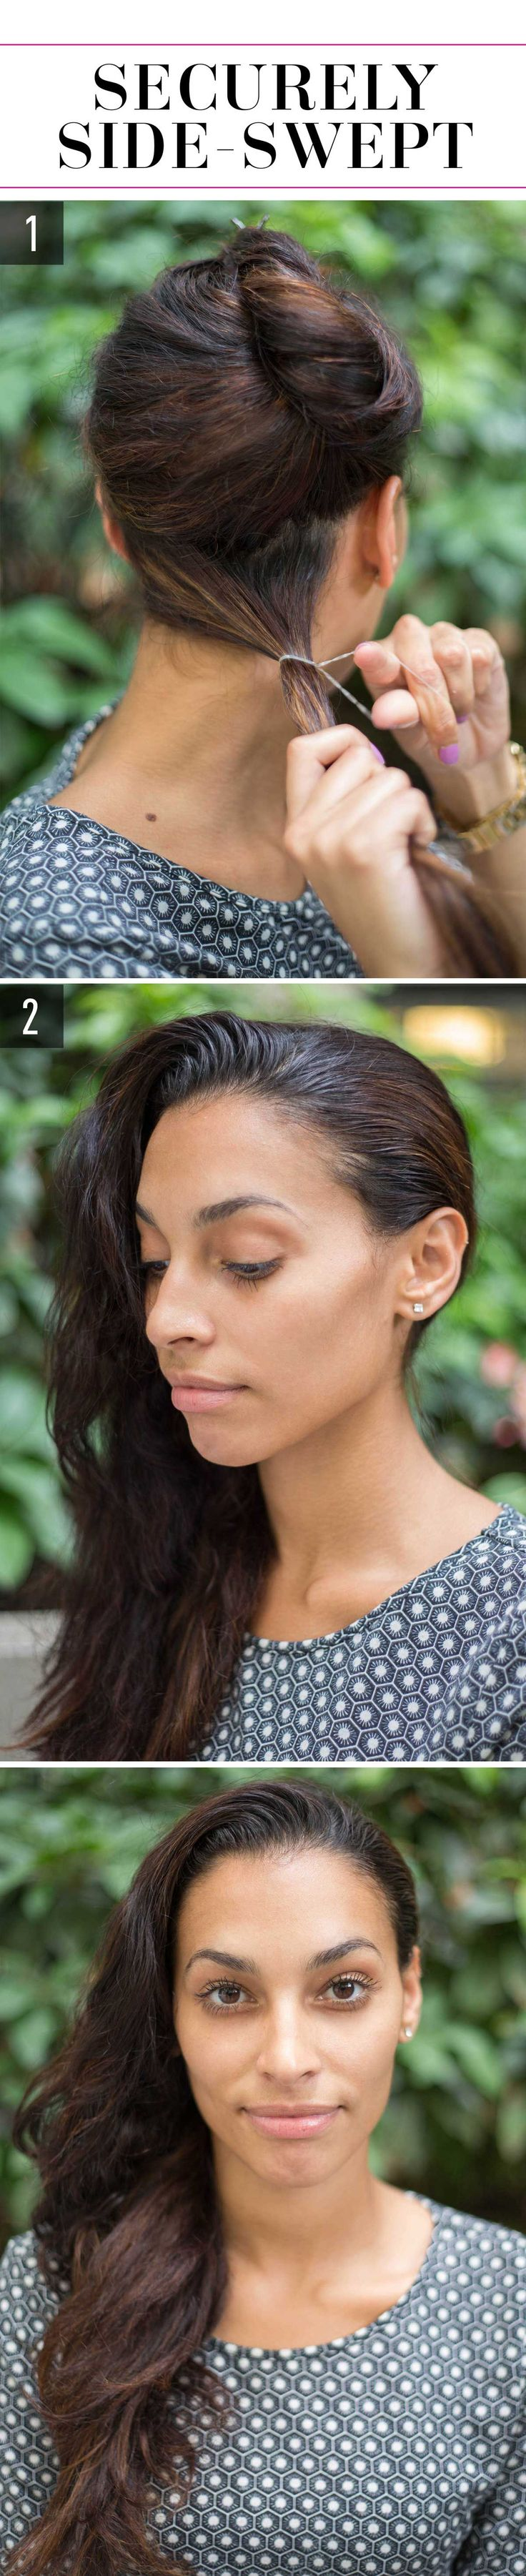 542 best Hair Styles images on Pinterest